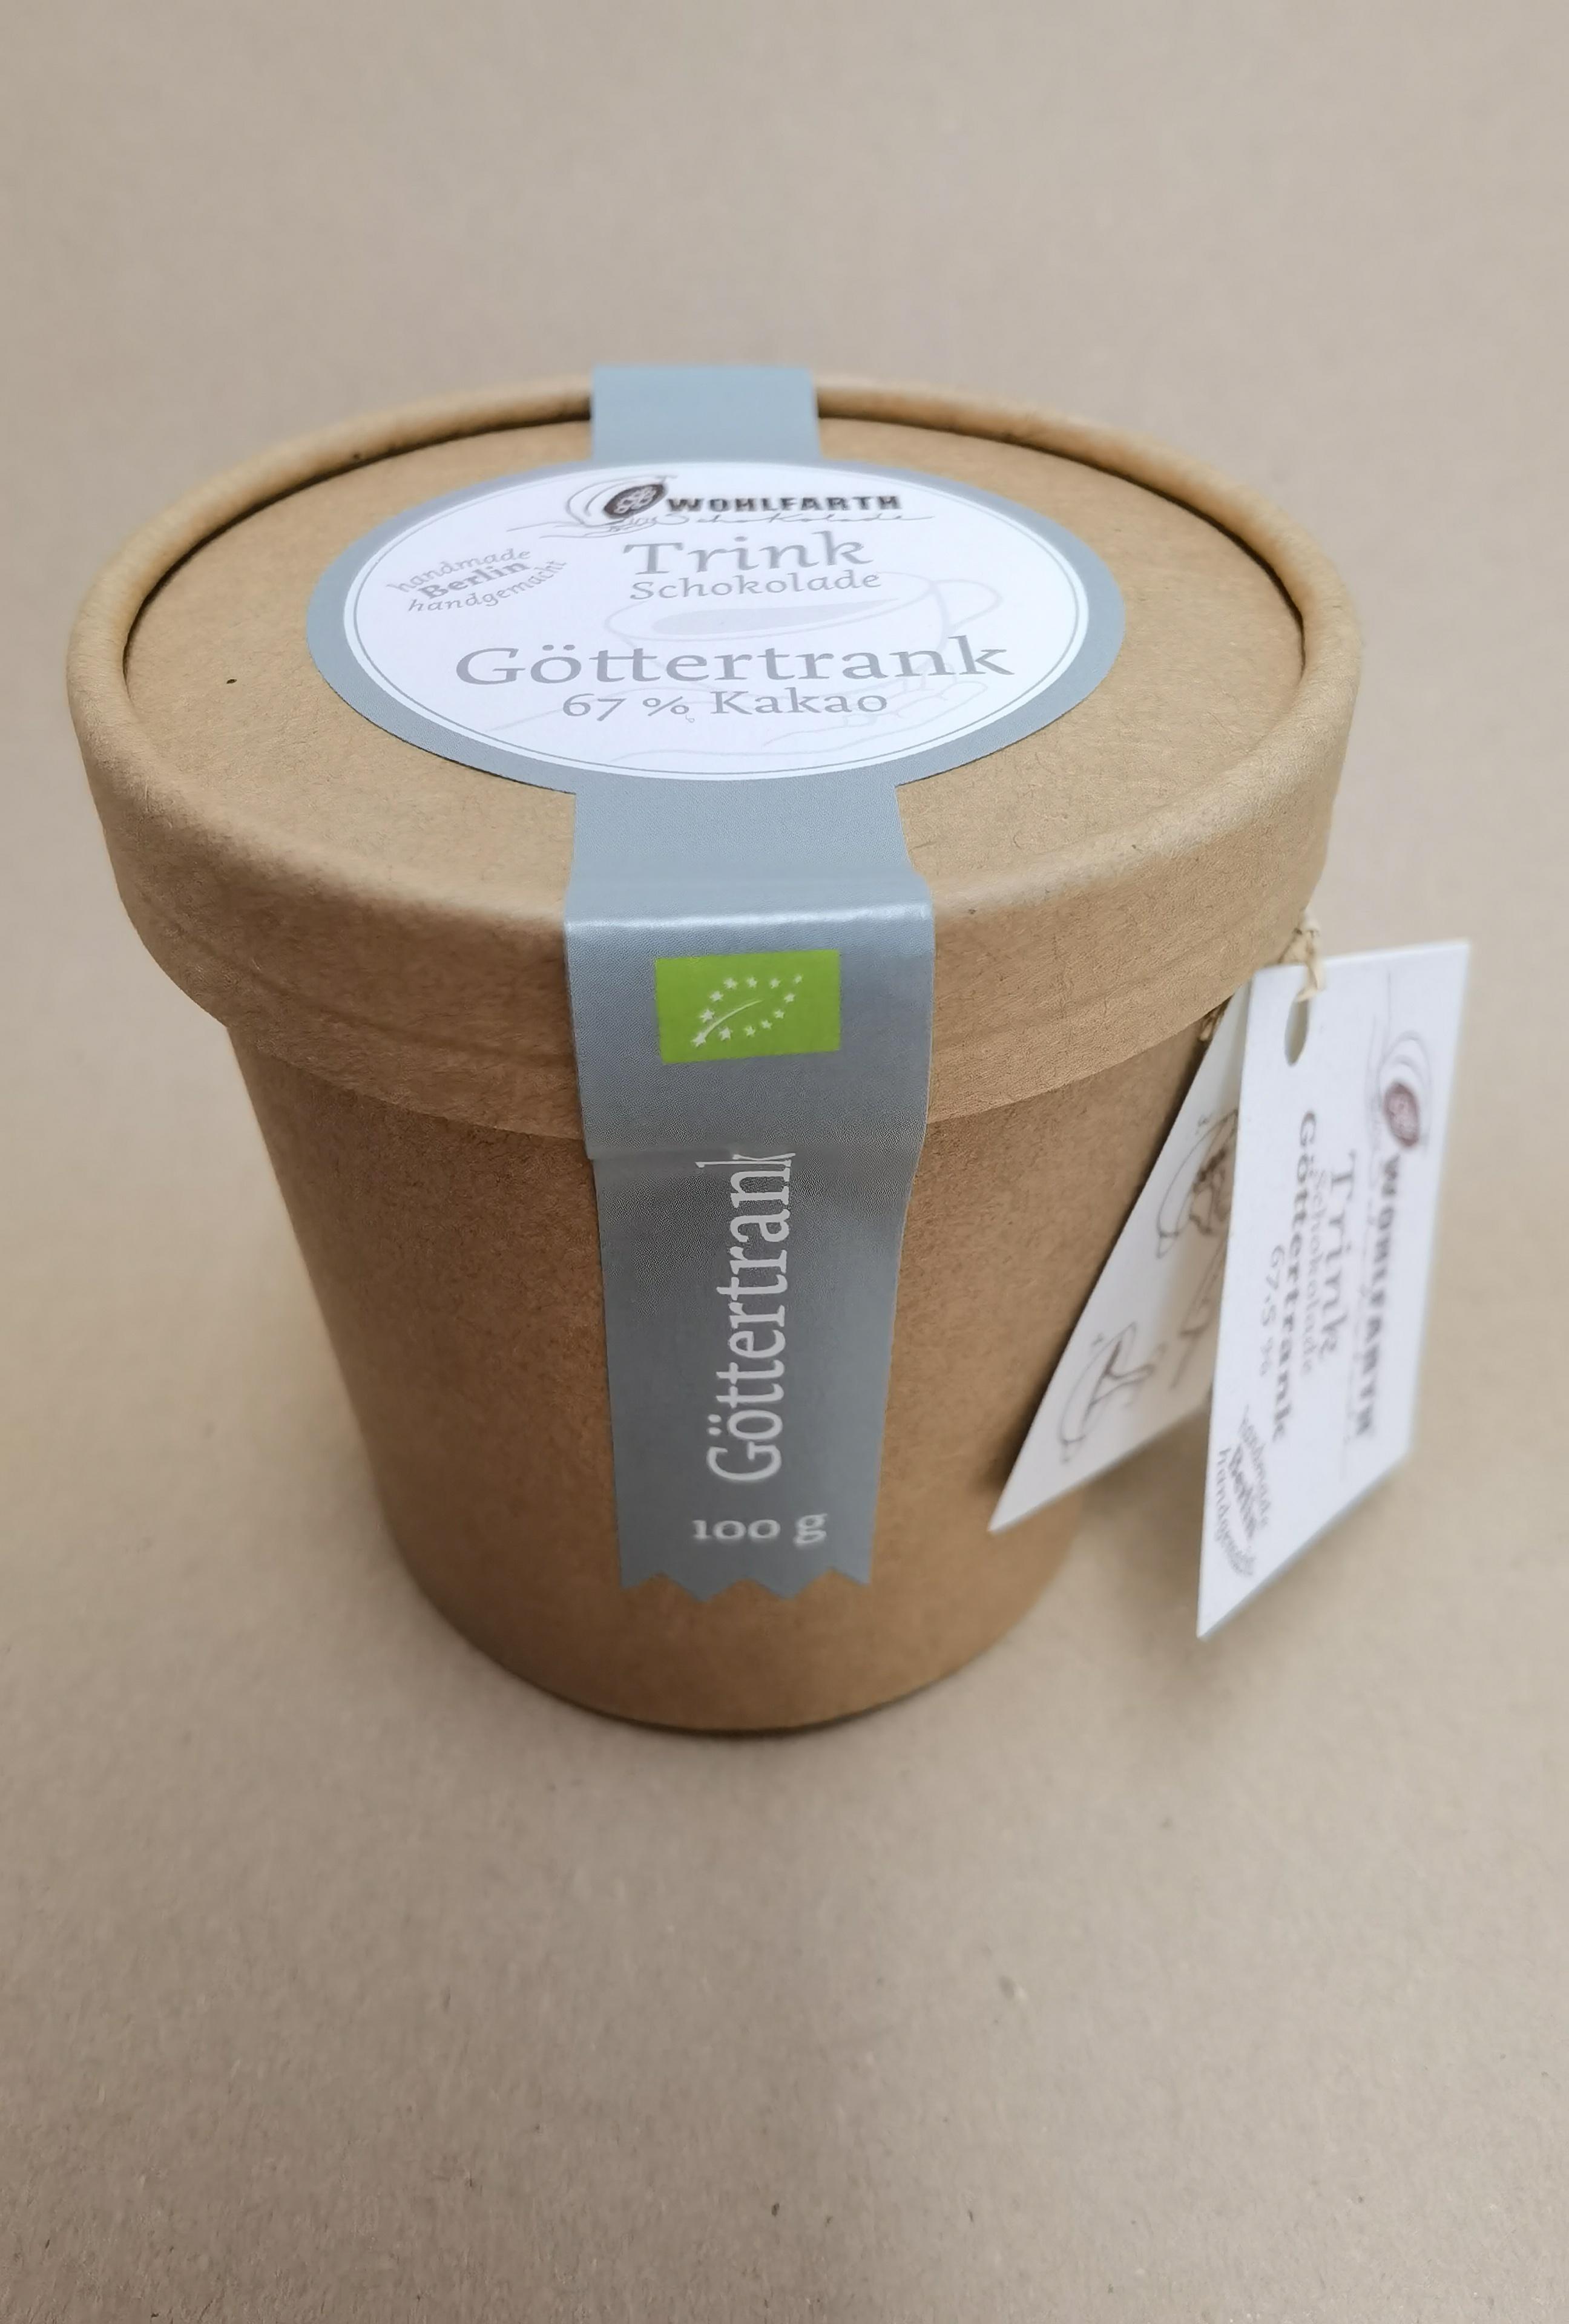 WOLFARTH Schokolade | Trinkschokolade »Göttertrank« 67% | BIO